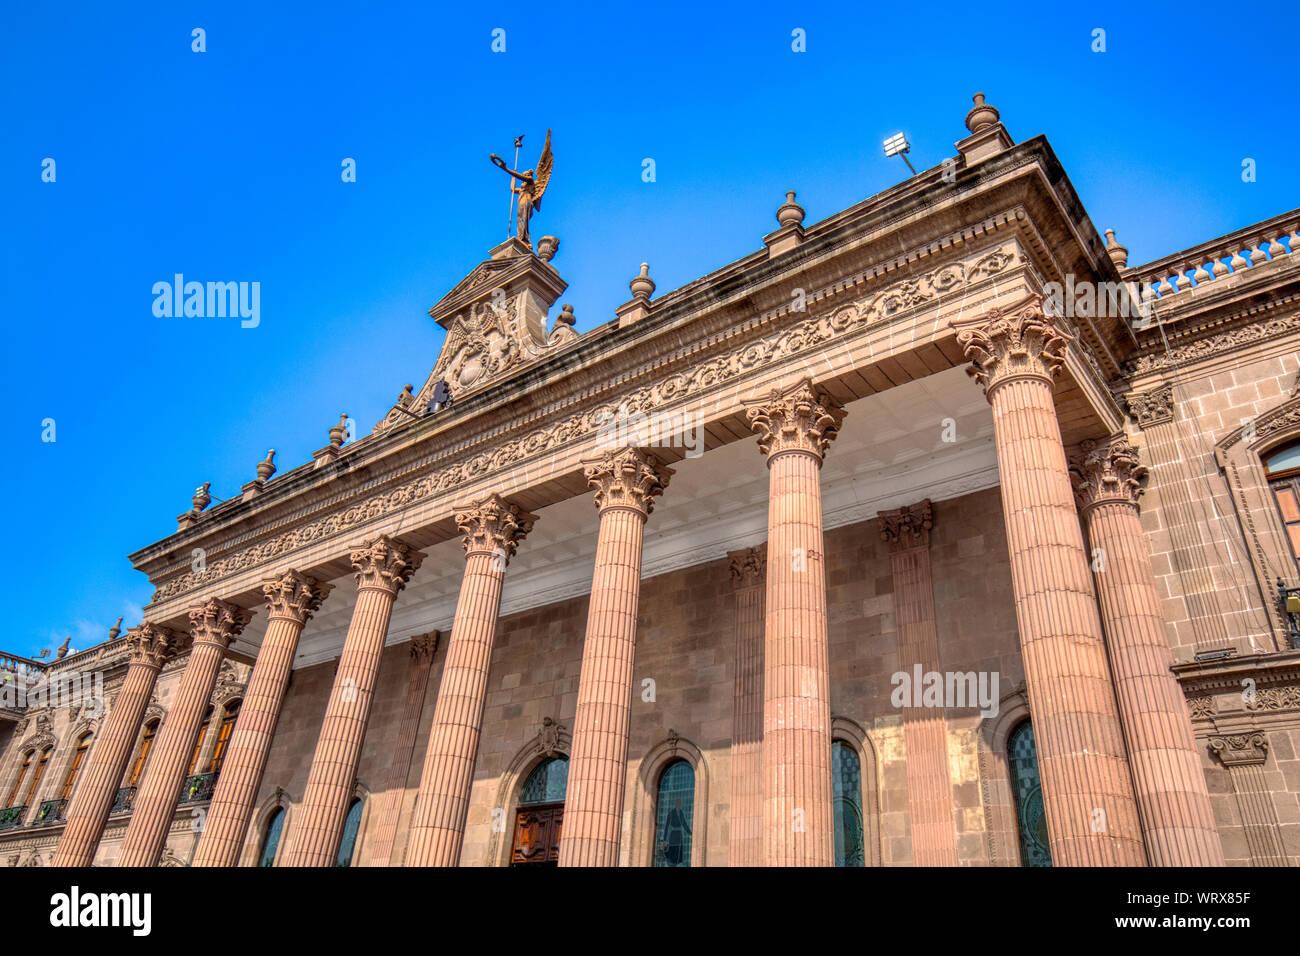 Monterrey, Macroplaza, Government Palace (Palacio del Gobierno) Stock Photo